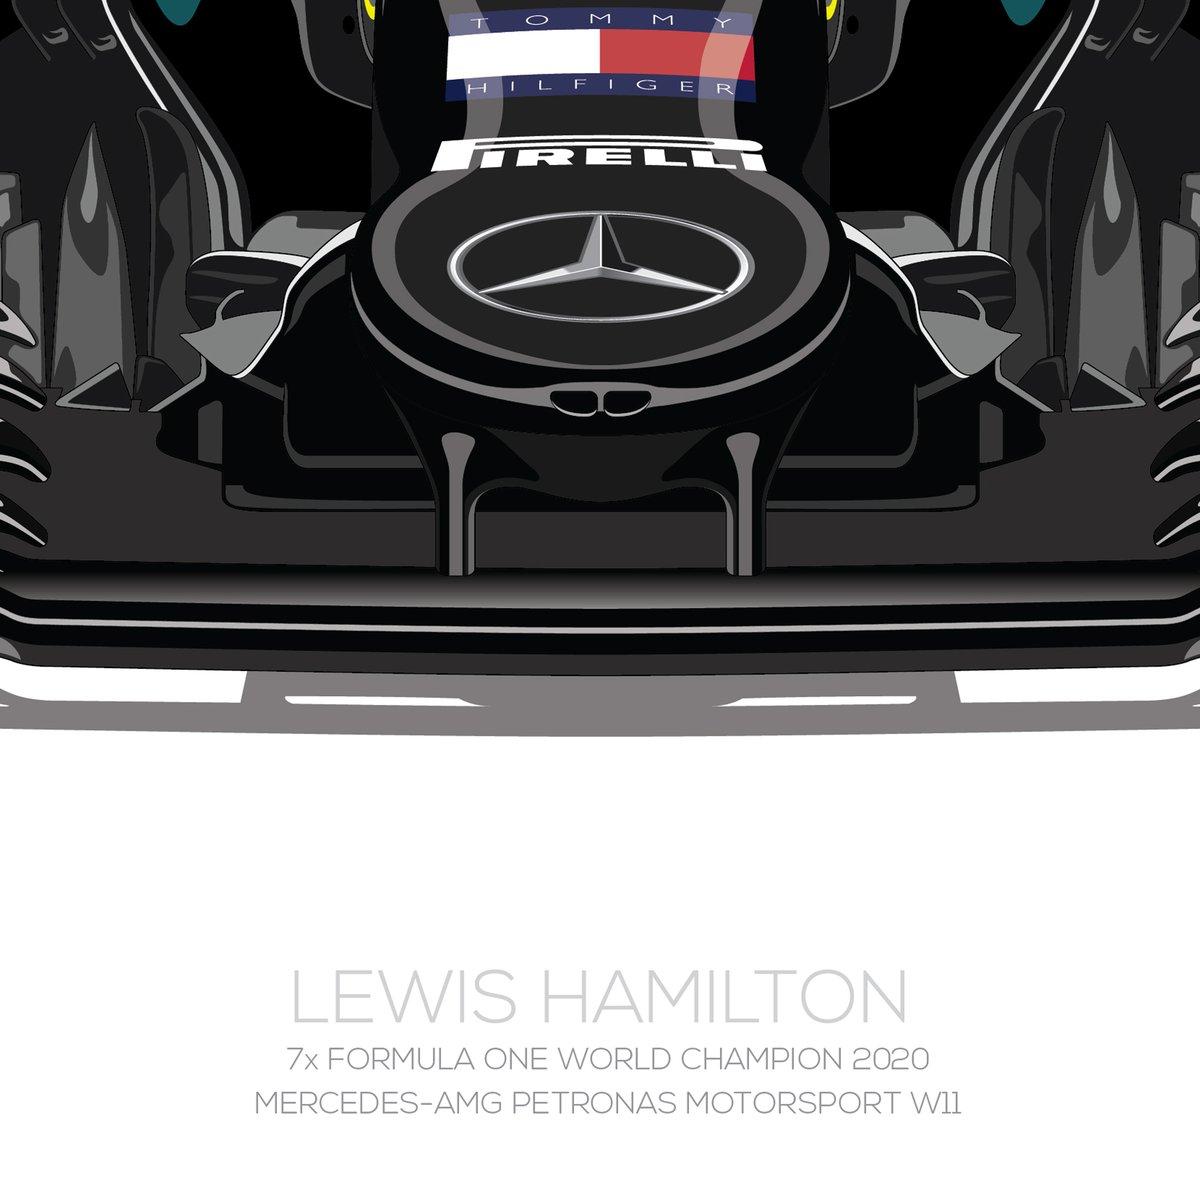 LEWIS HAMILTON 2020 (D1-174)